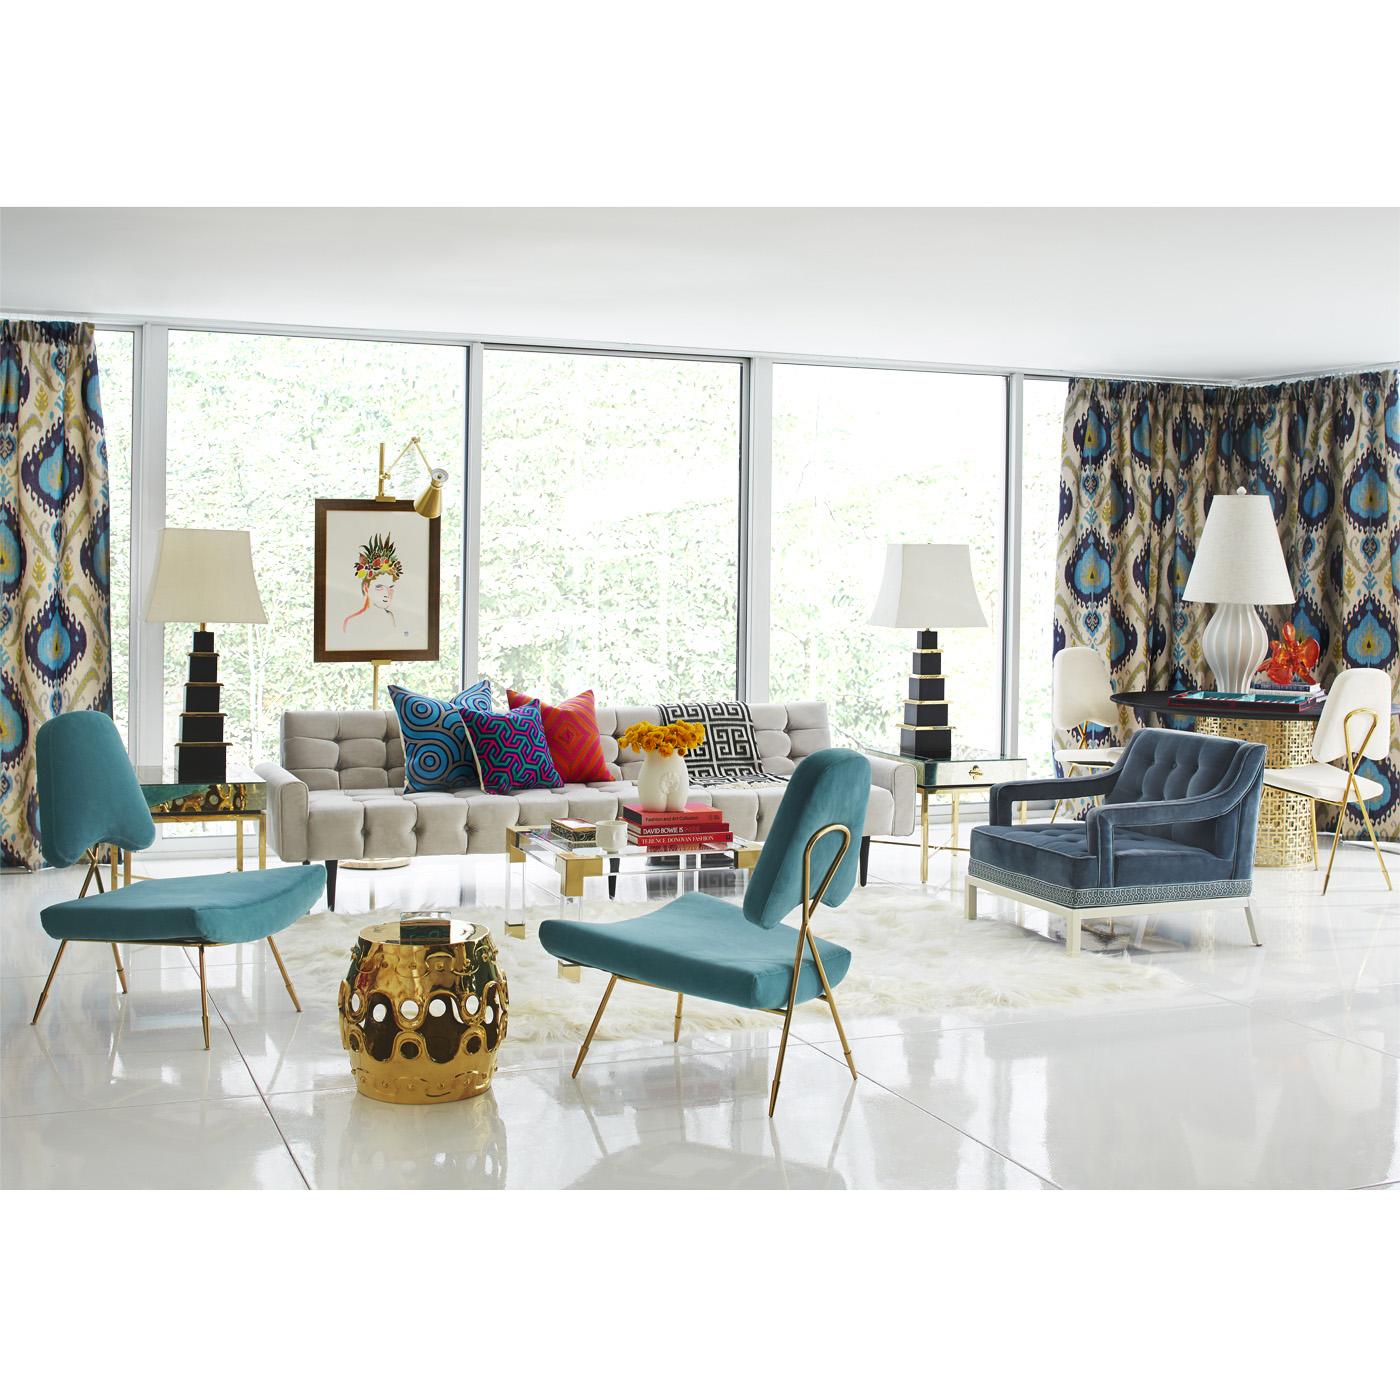 jonathan adler chair video game target spring 2014 stellar interior design